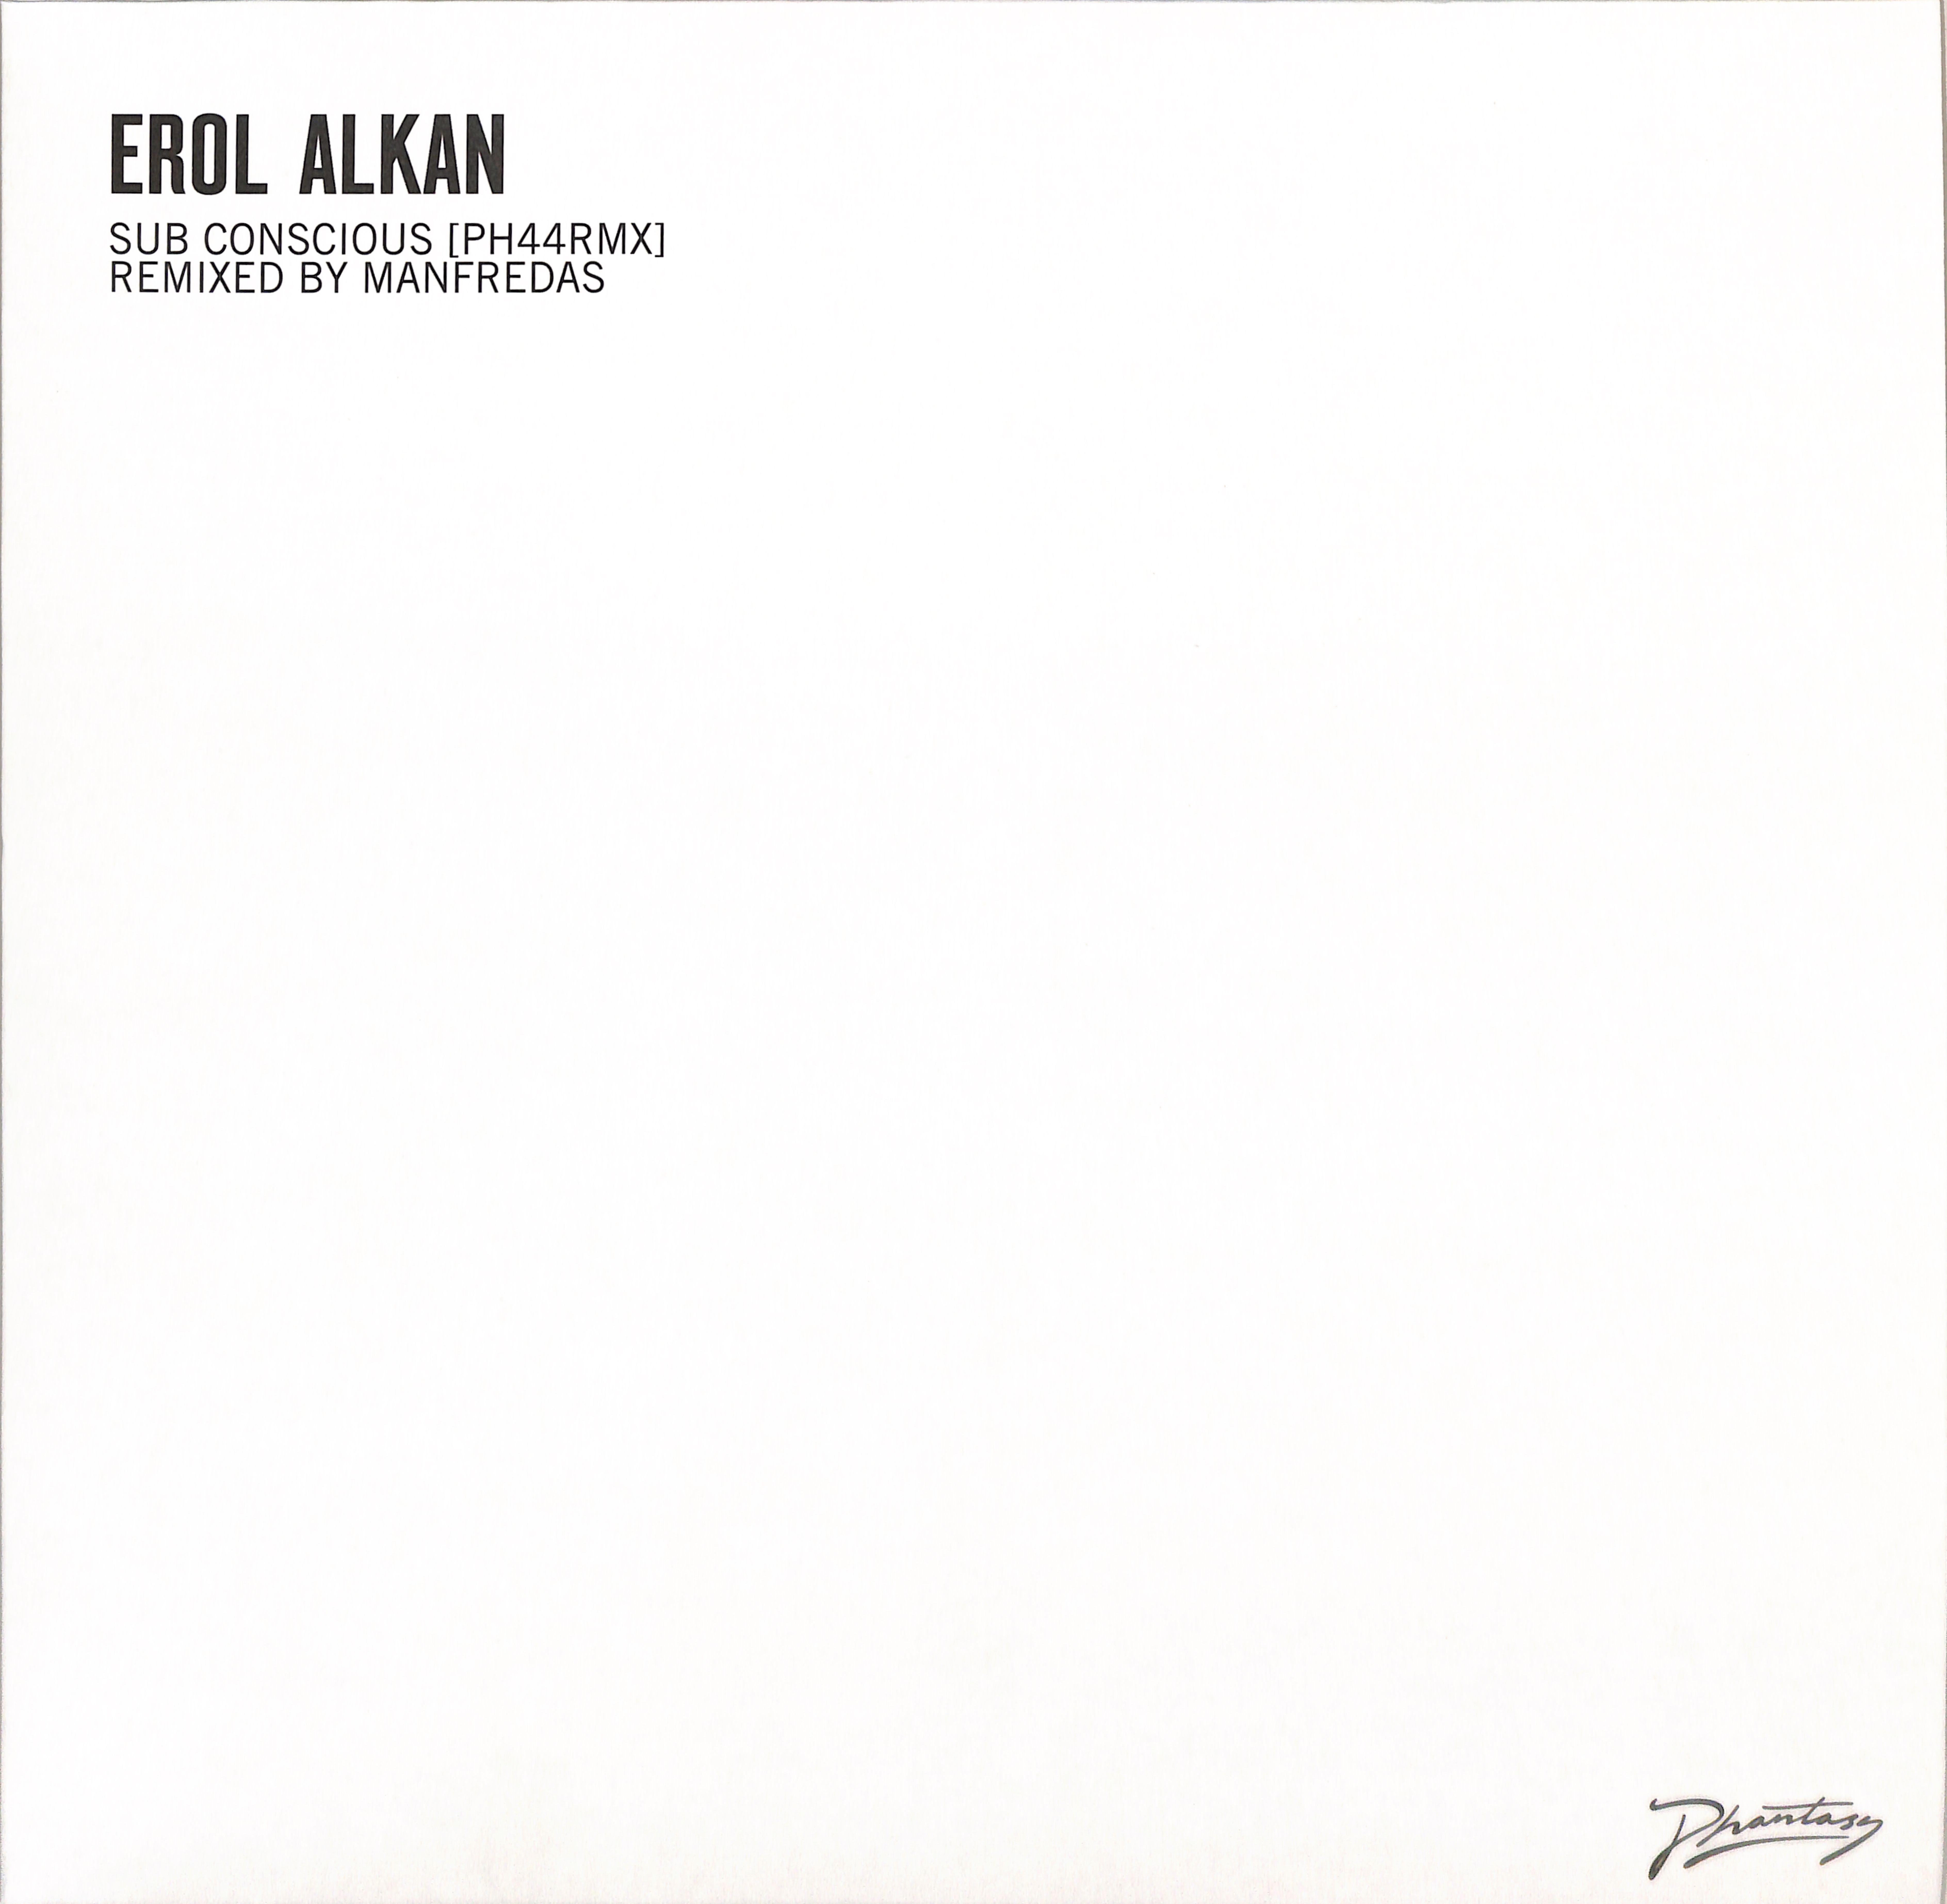 Erol Alkan - SUB CONCIOUS